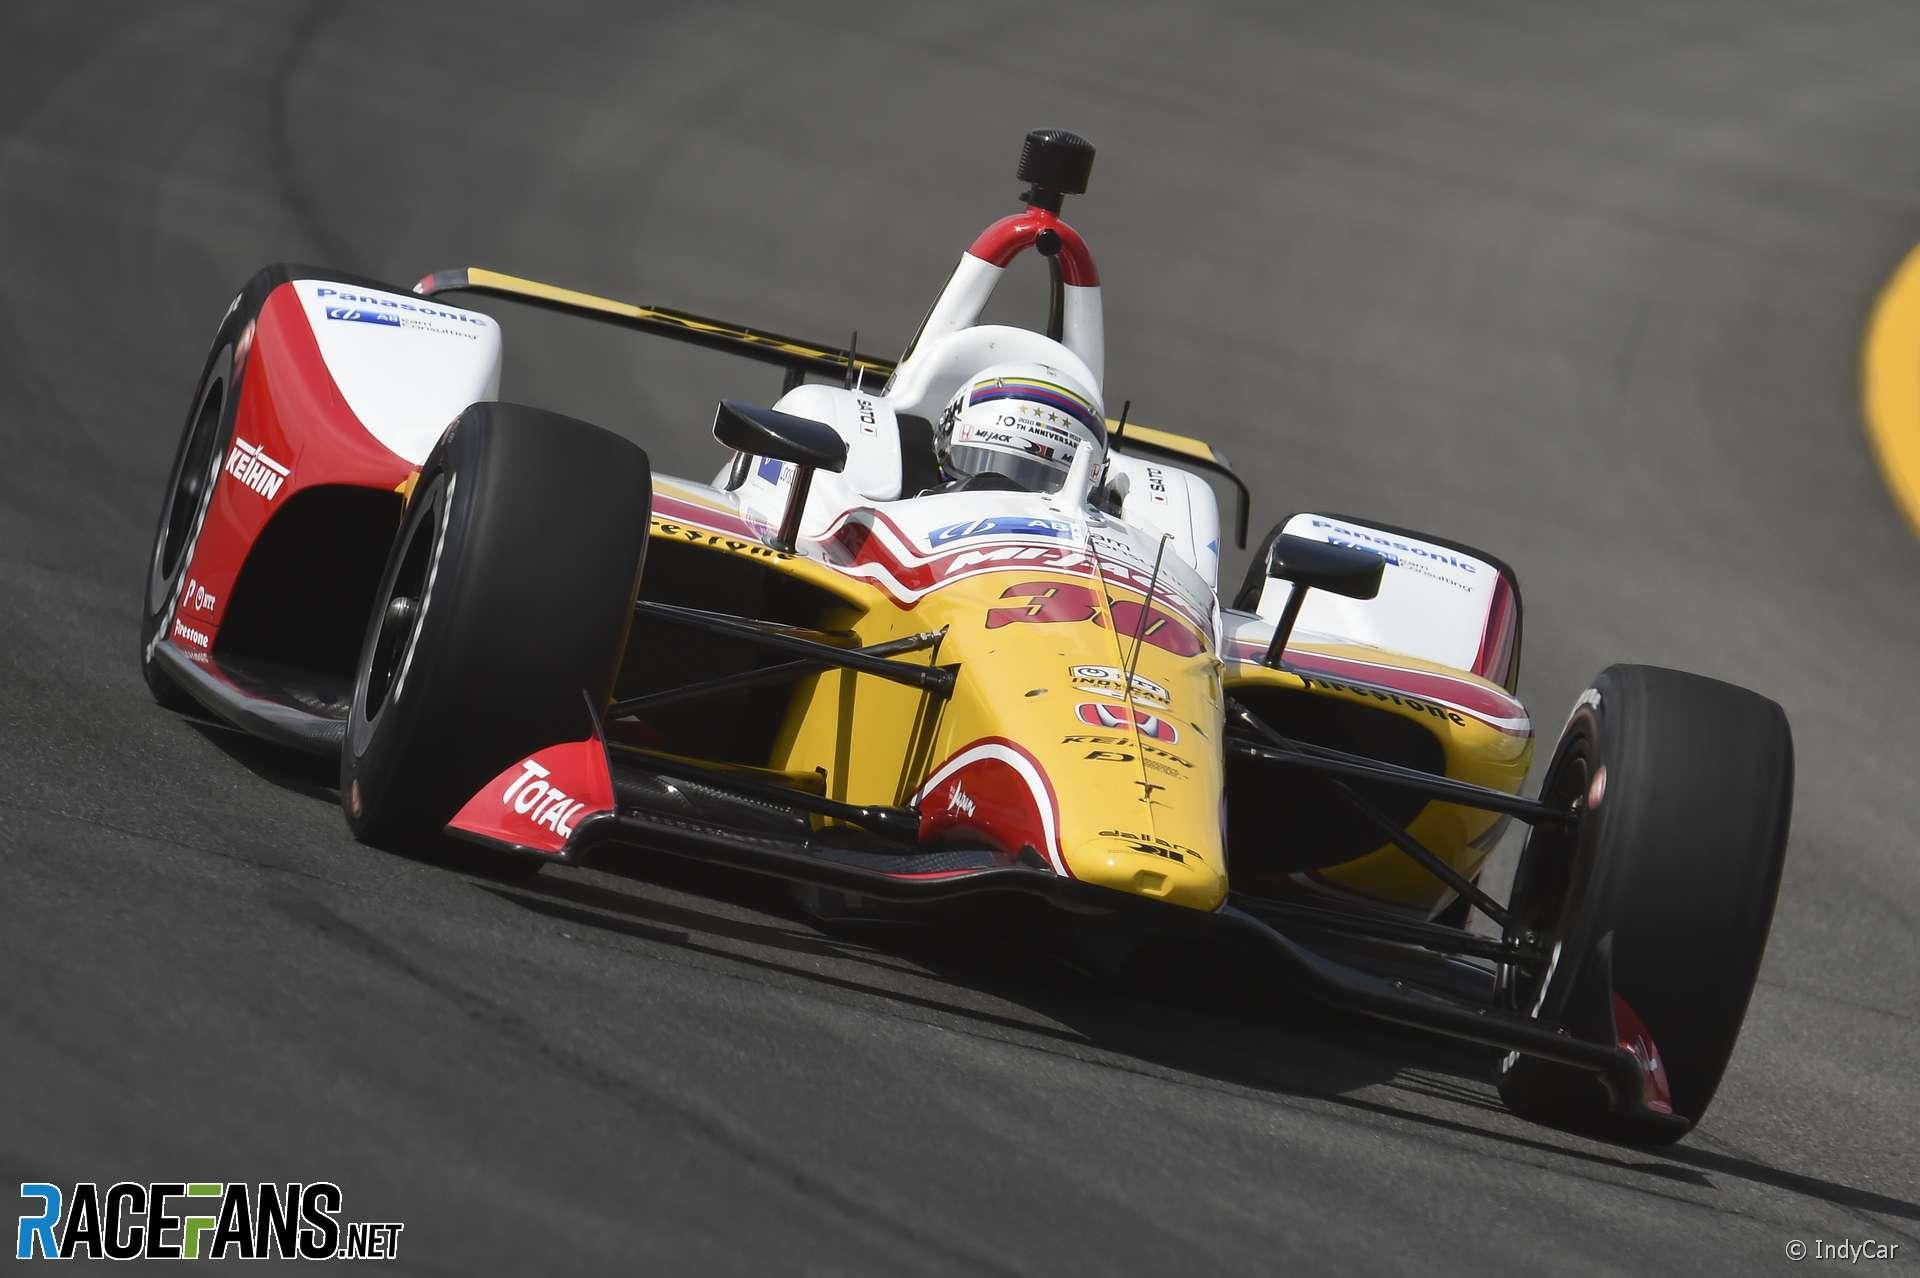 Takuma Sato, RLL, IndyCar, Pocono, 2019